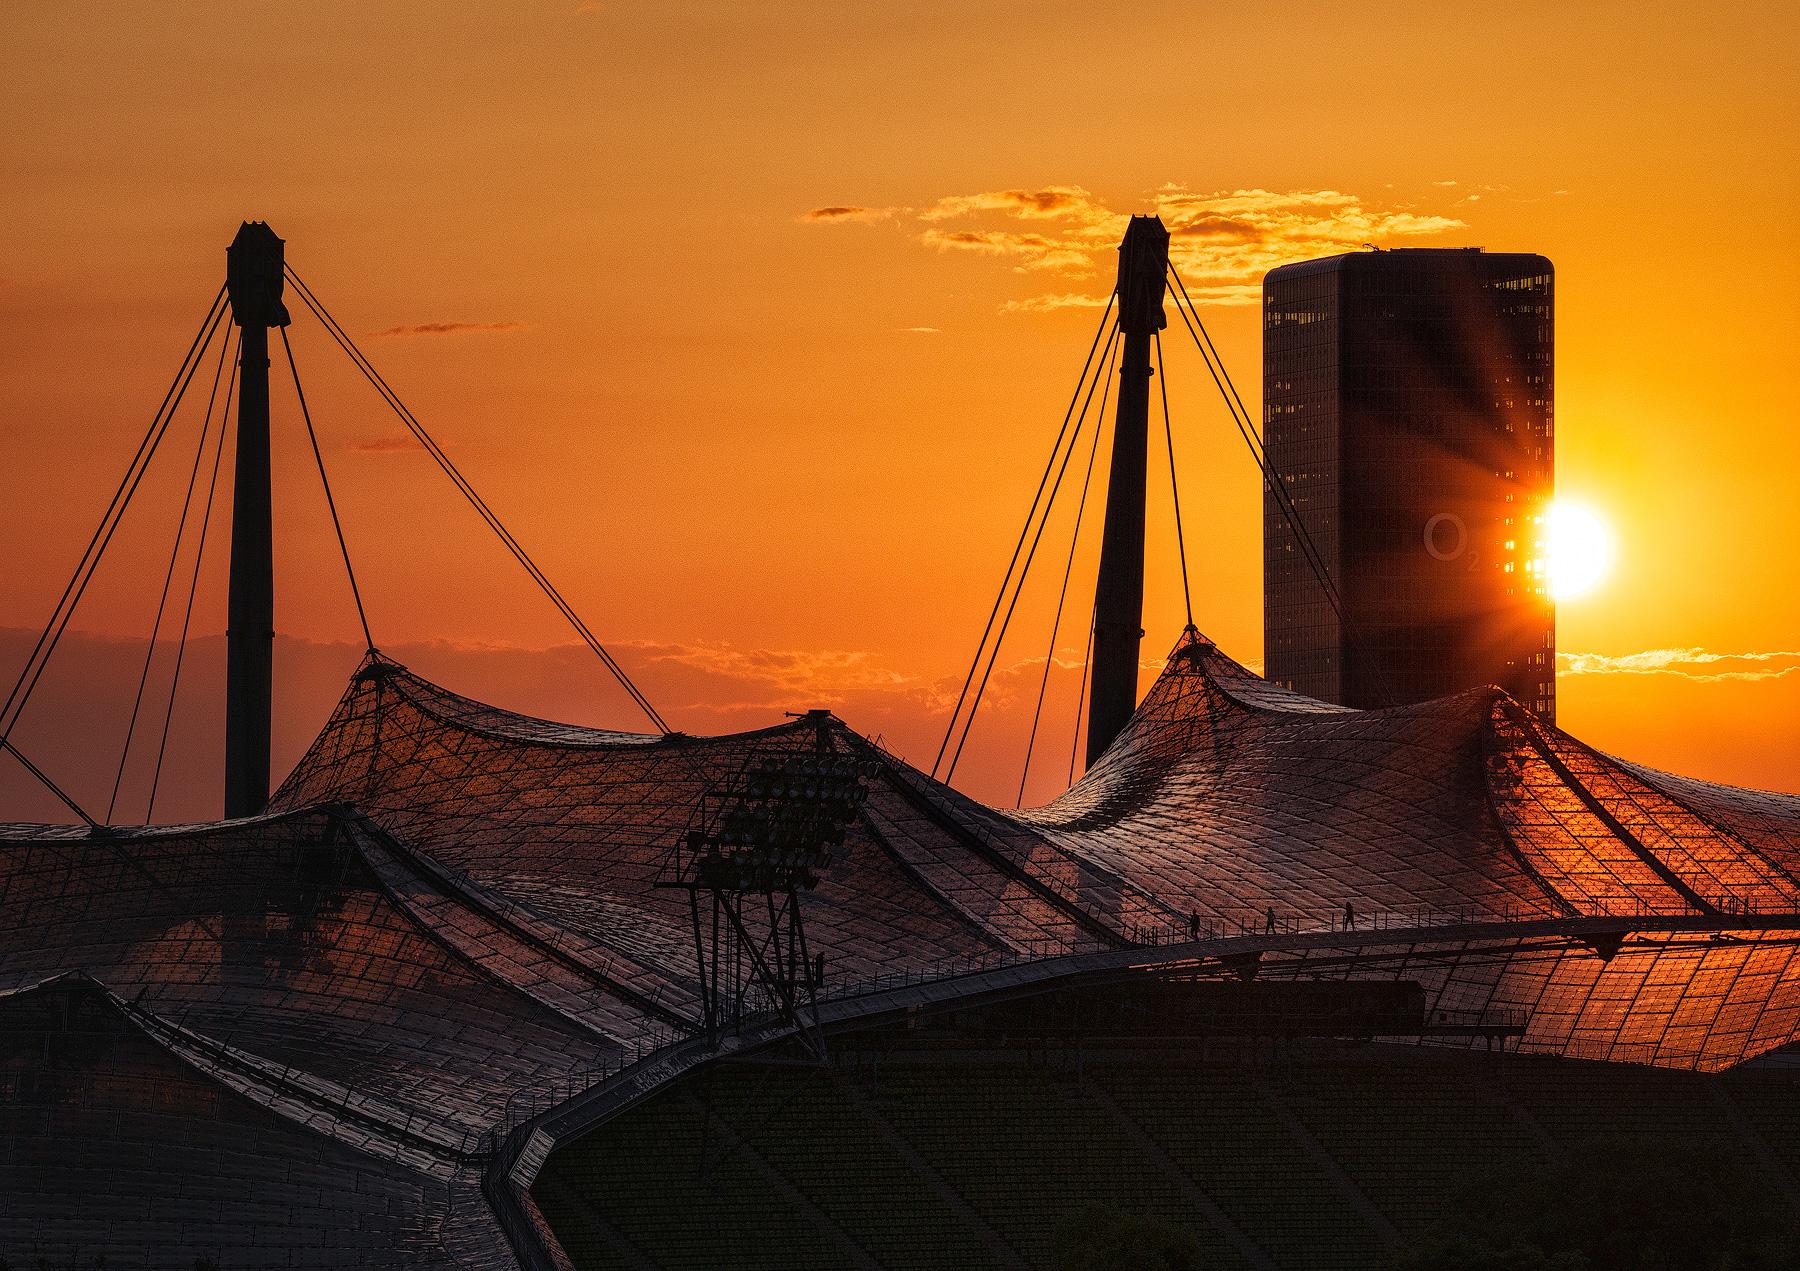 Sonnenuntergang hinter dem Olympiastadion in München.